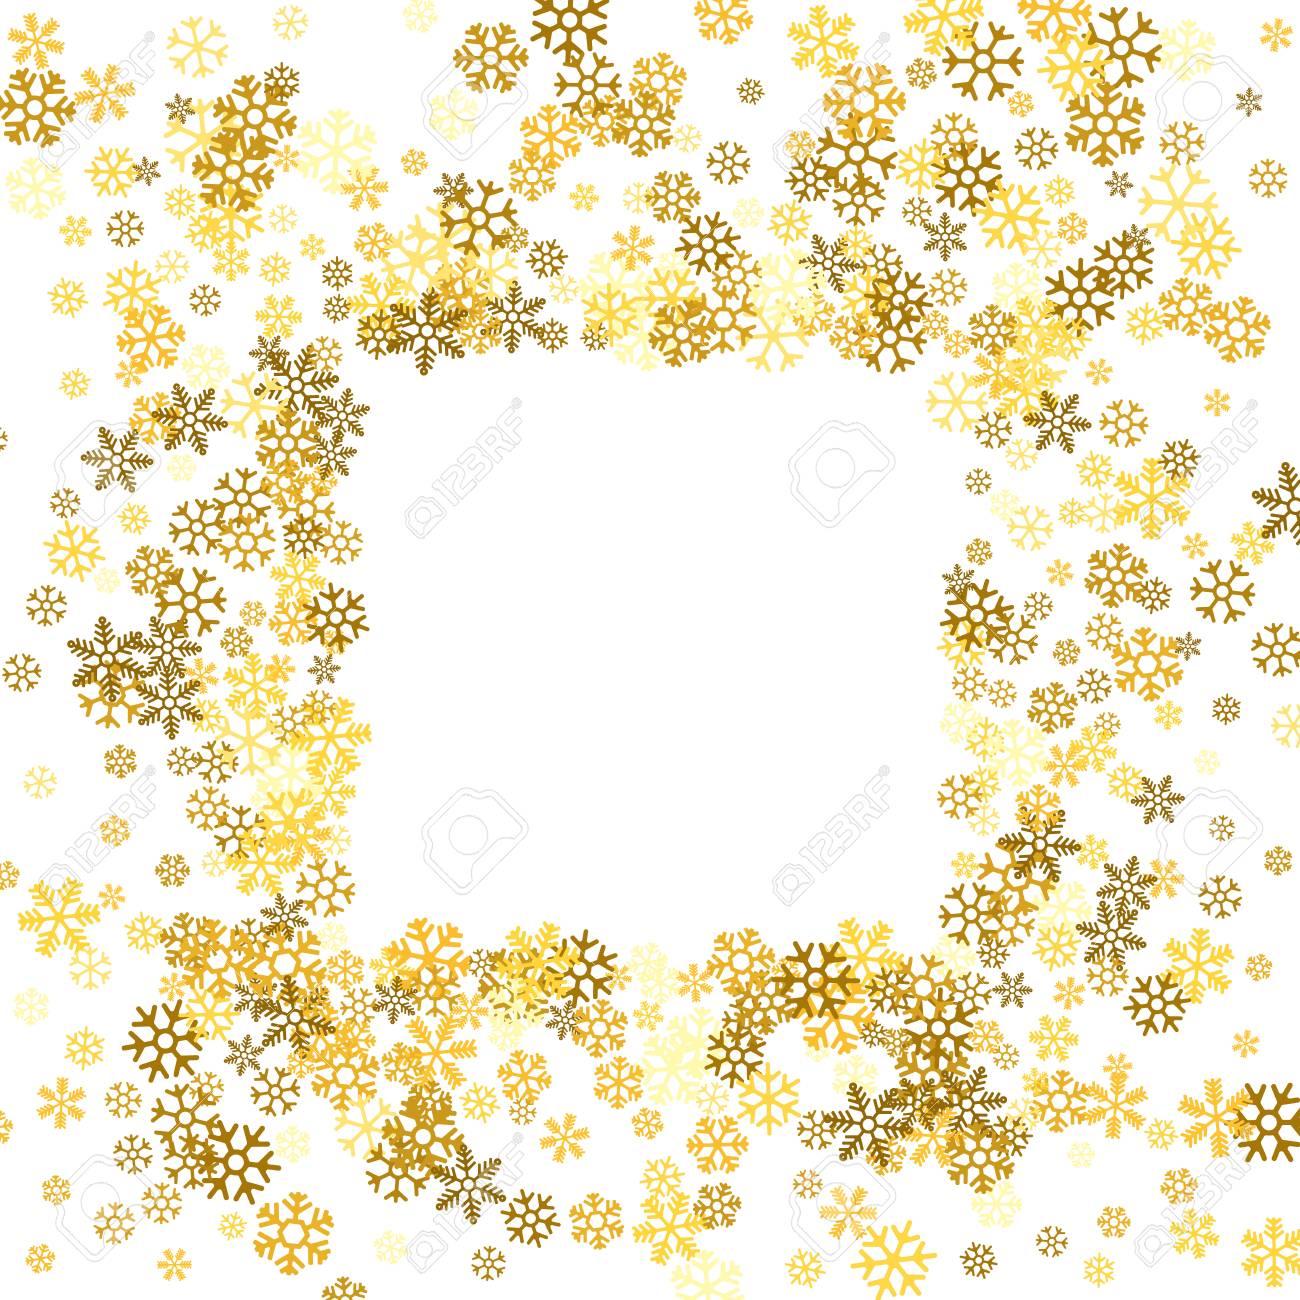 Square Gold Frame Or Border Of Random Scatter Golden Snowflakes